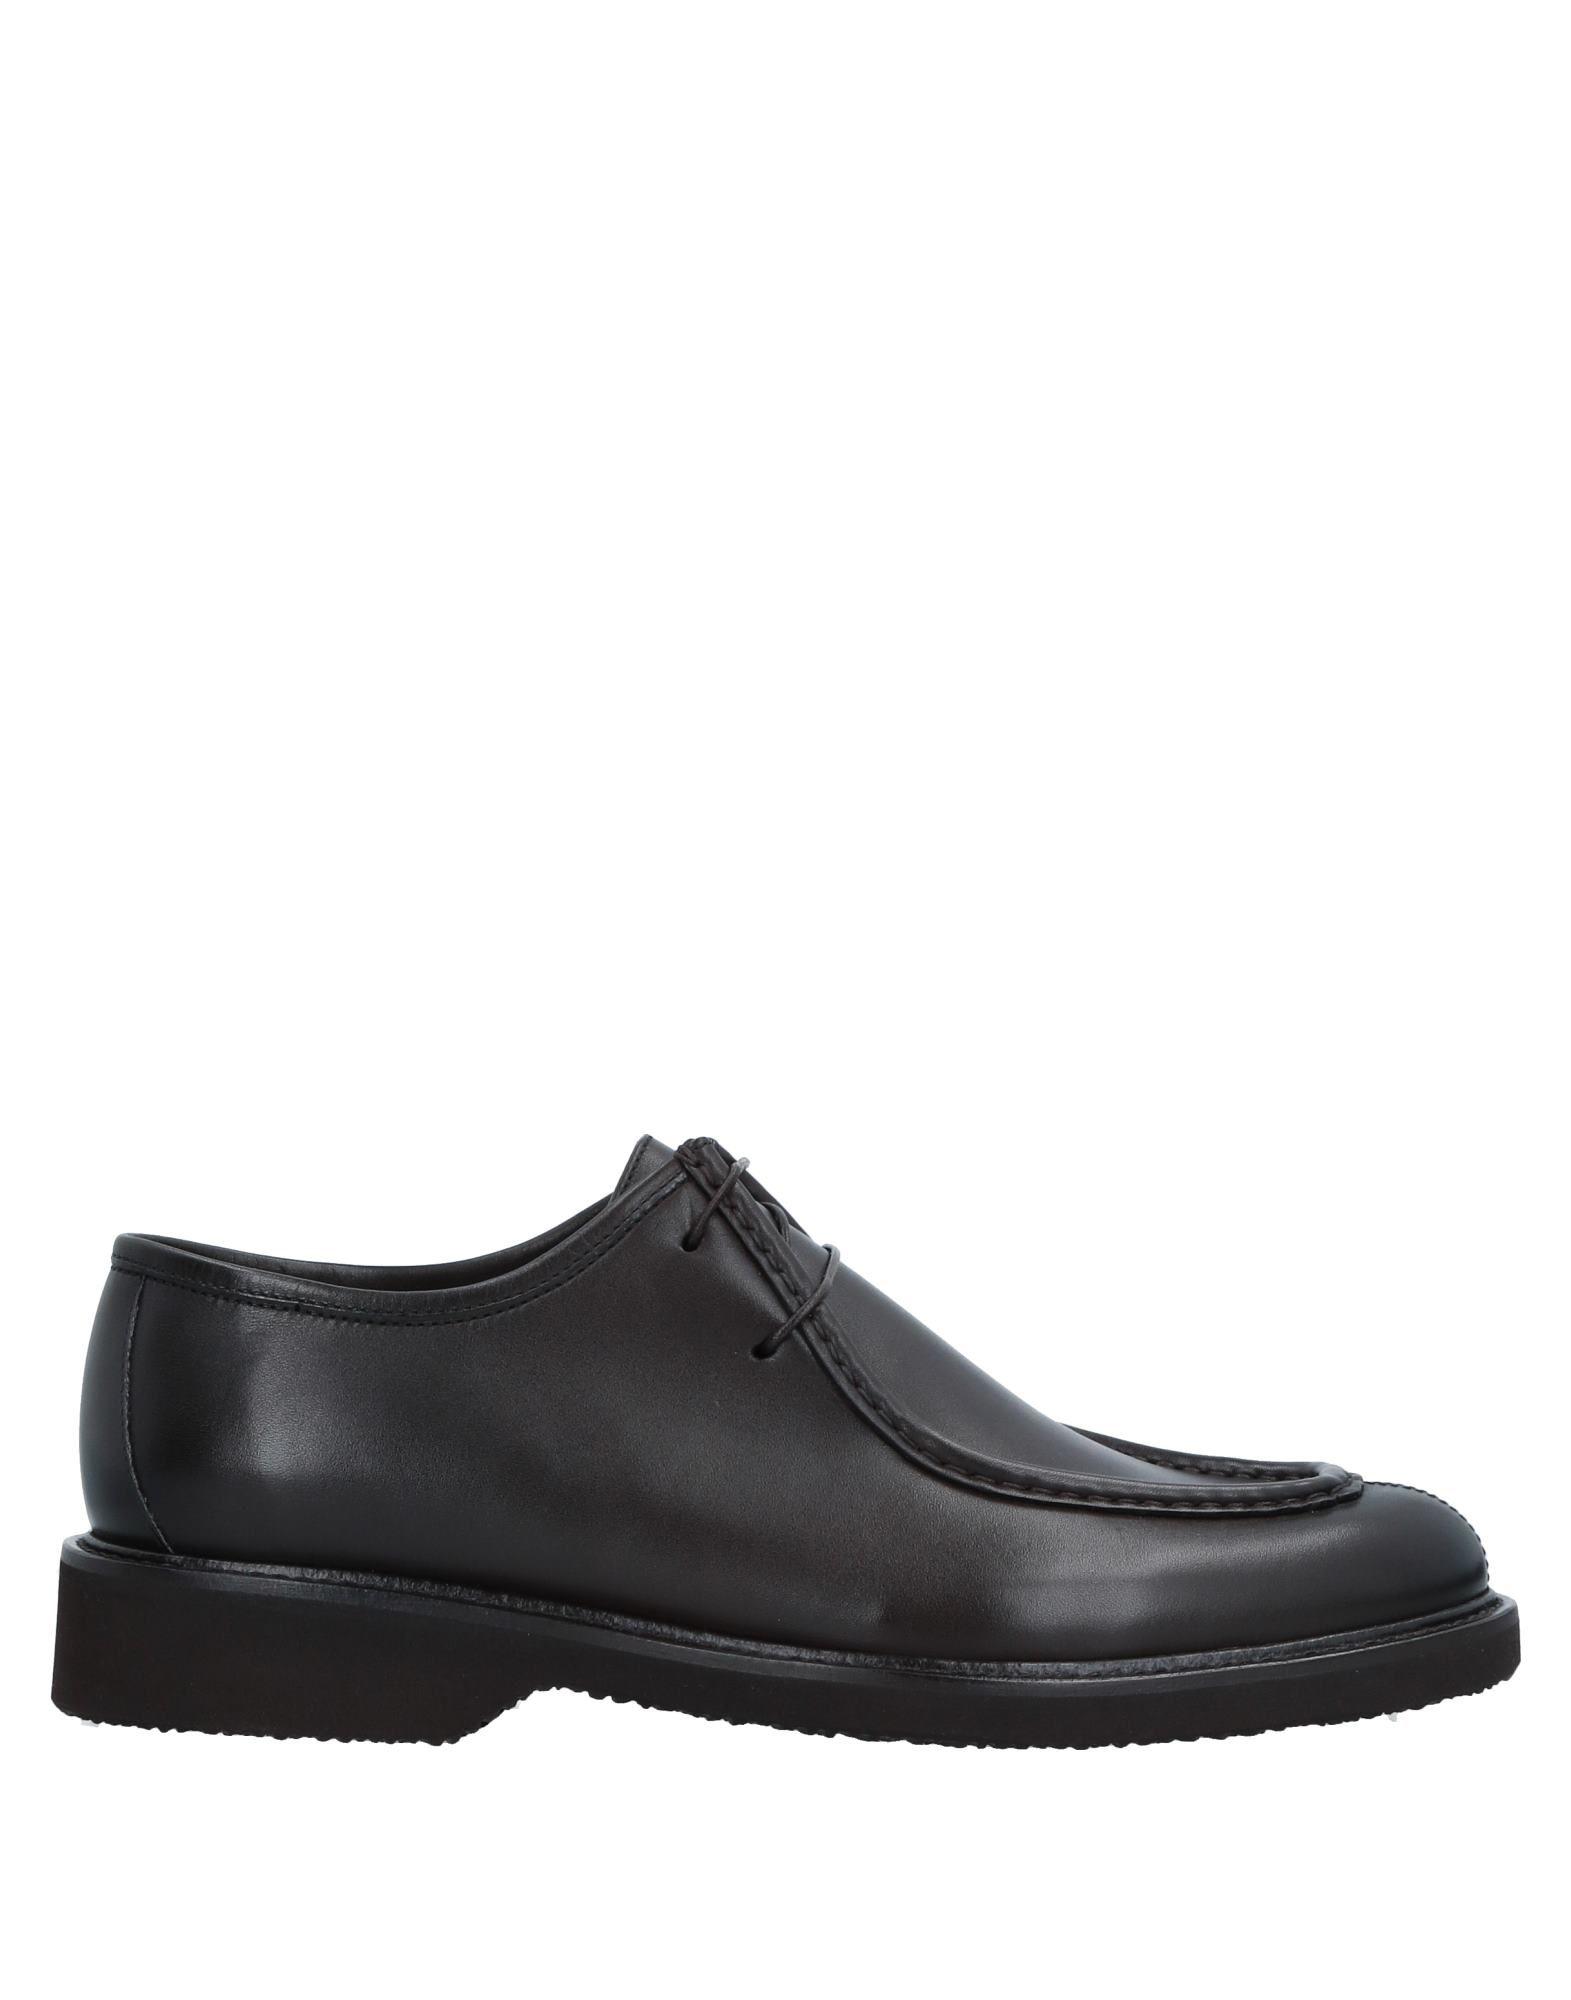 Ermenegildo Zegna Schnürschuhe Herren  11518903JD Gute Qualität beliebte Schuhe